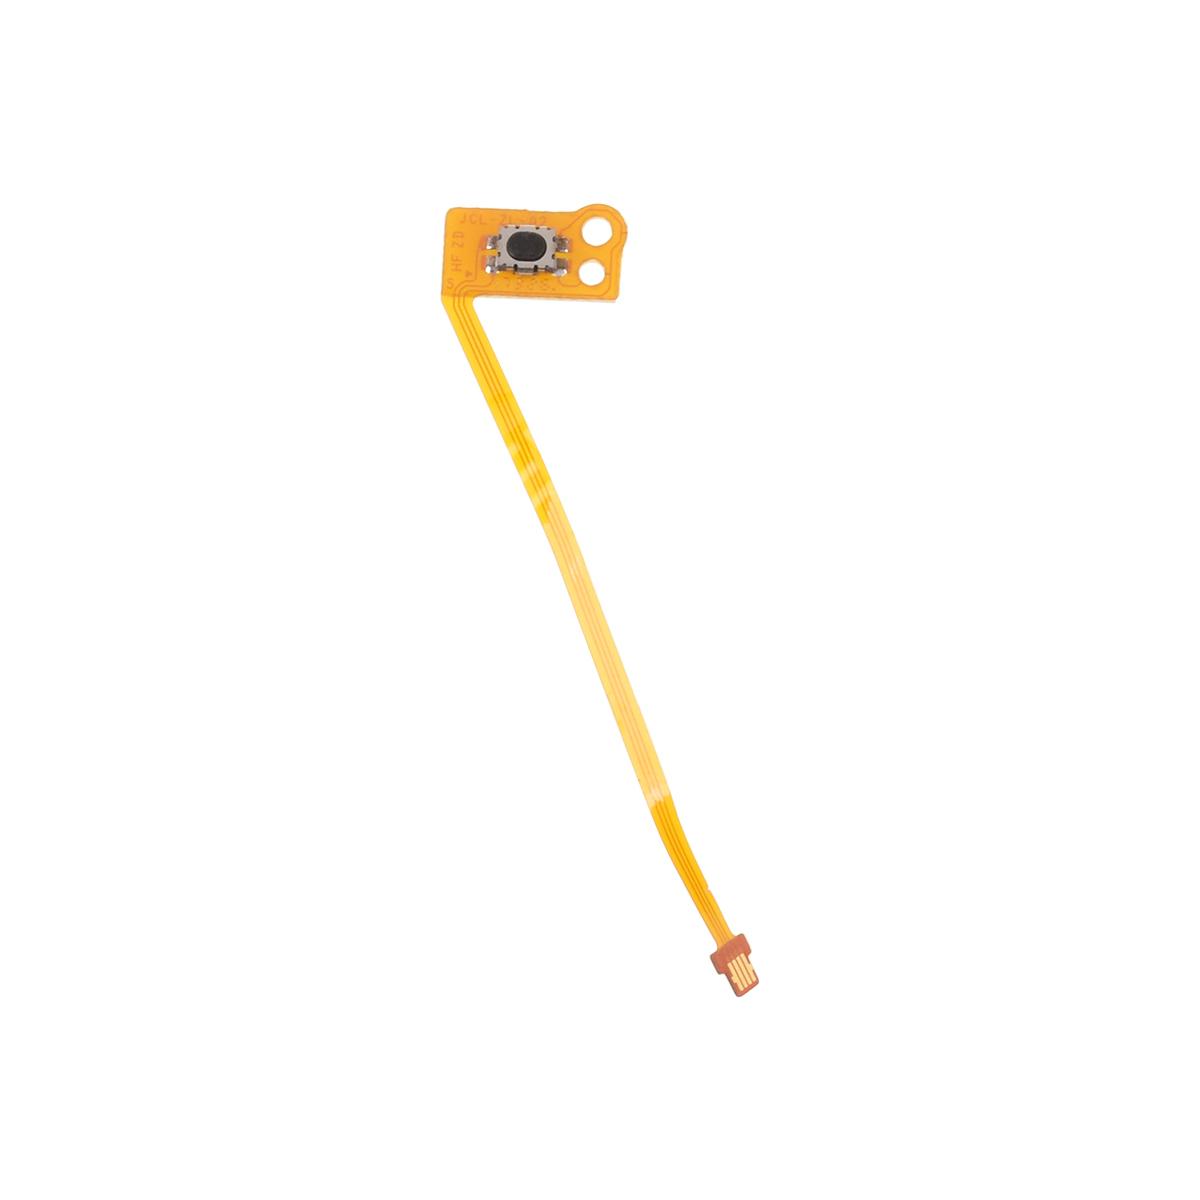 JOY-CON ZL Button Flex Cable